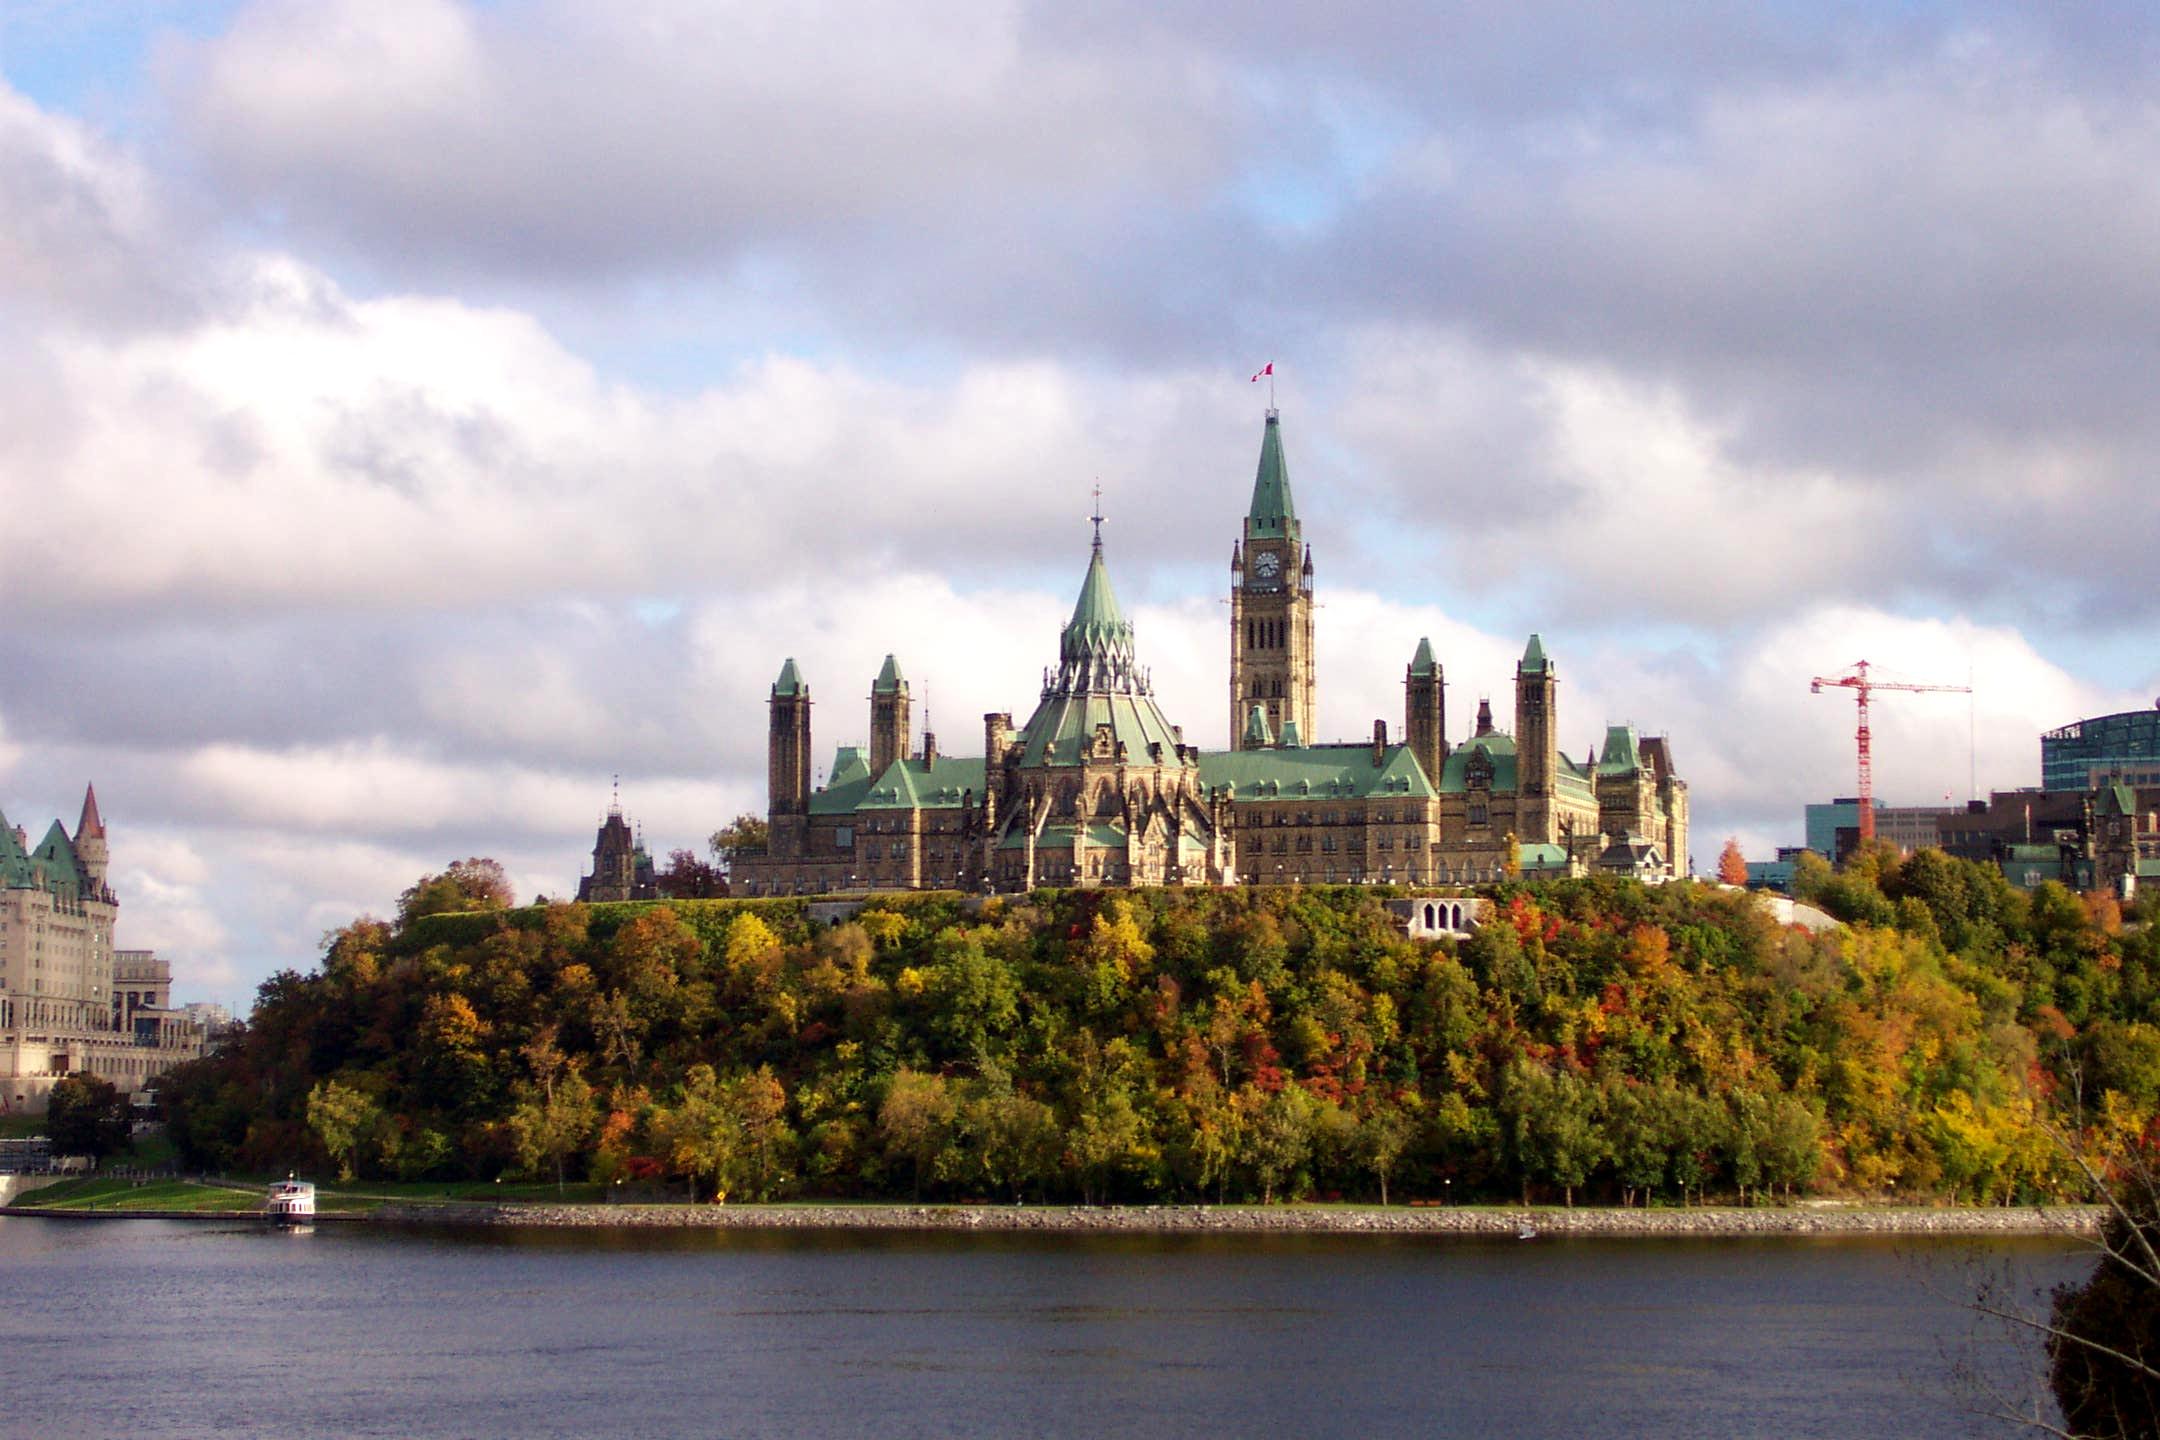 Parliament Building, Ontario, Canada  № 932251 бесплатно